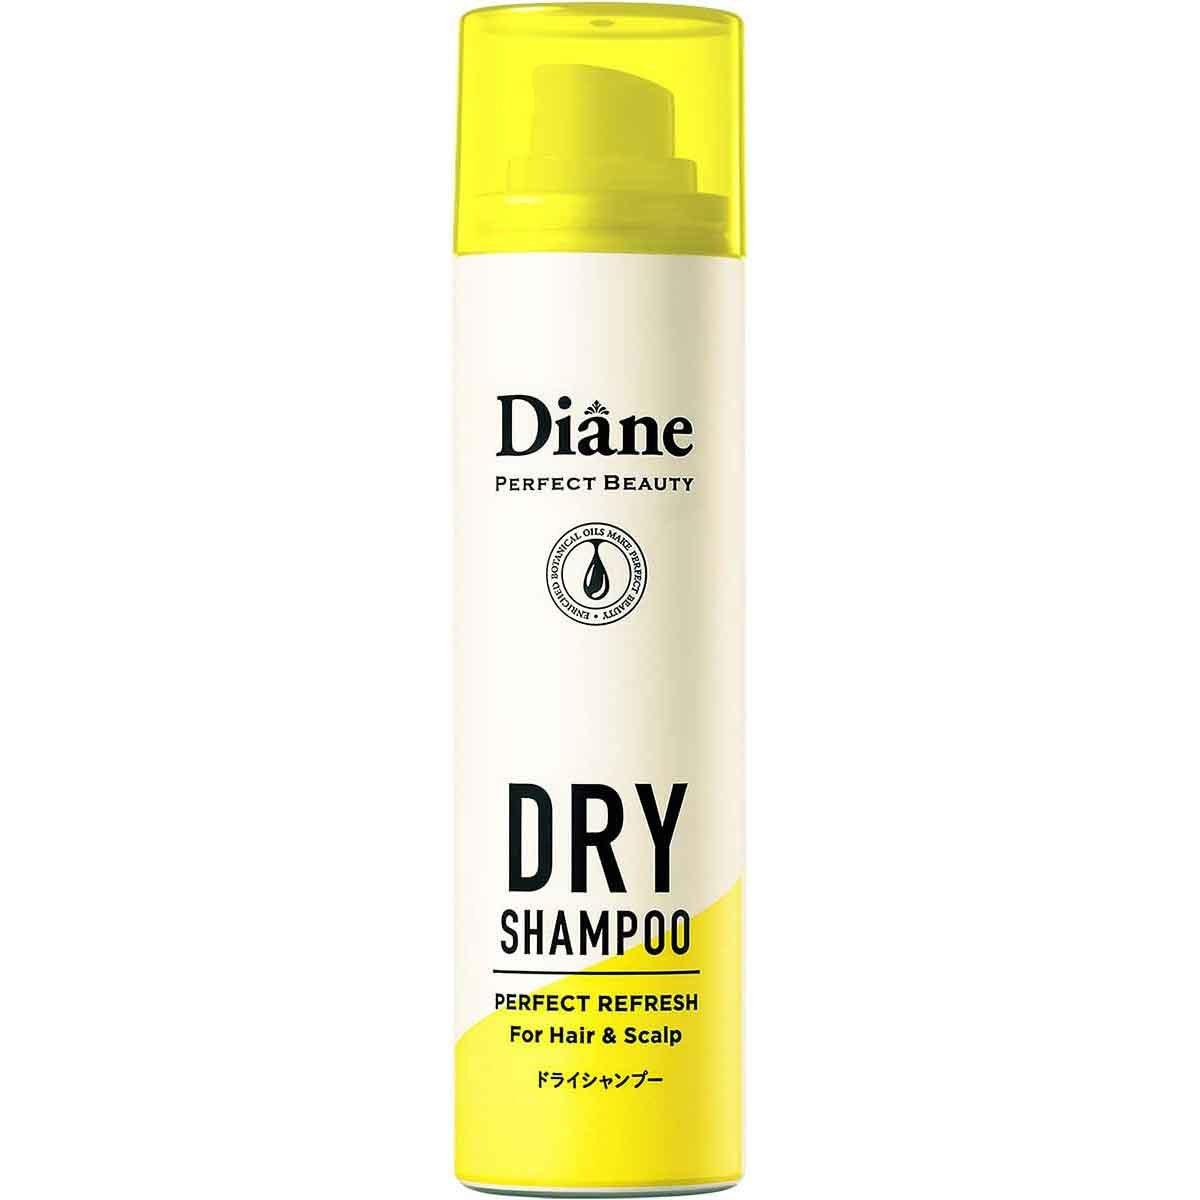 Diane(ダイアン) パーフェクトドライシャンプー